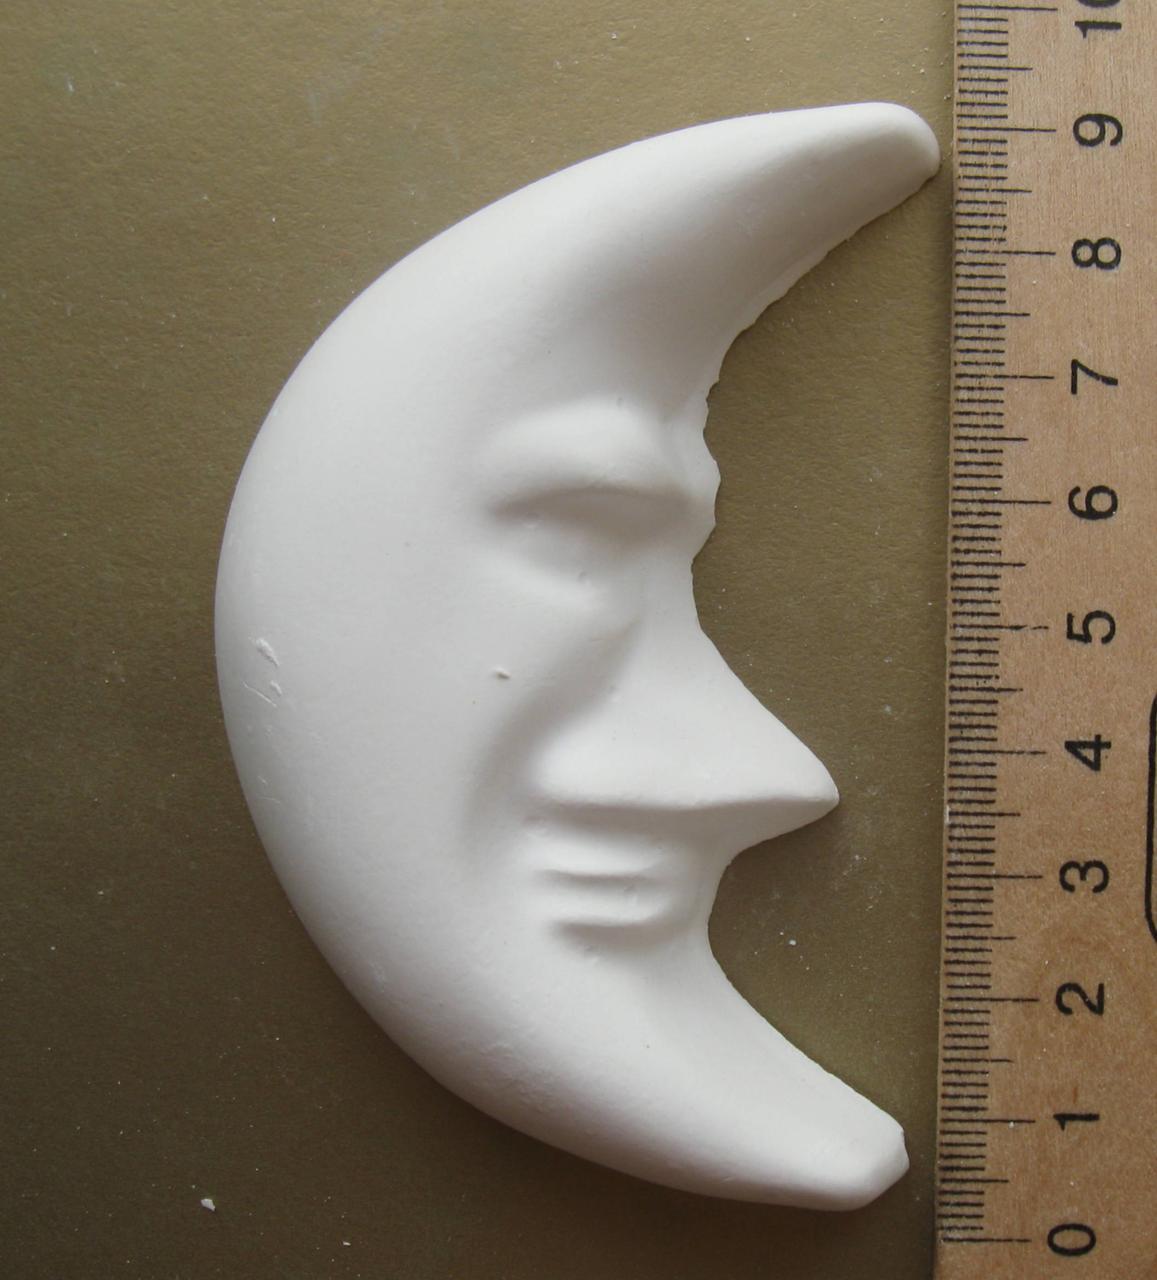 Гипсовая фигурка заготовка для раскрашивания. Гіпсова фігурка для розмальовування Месяц Луна